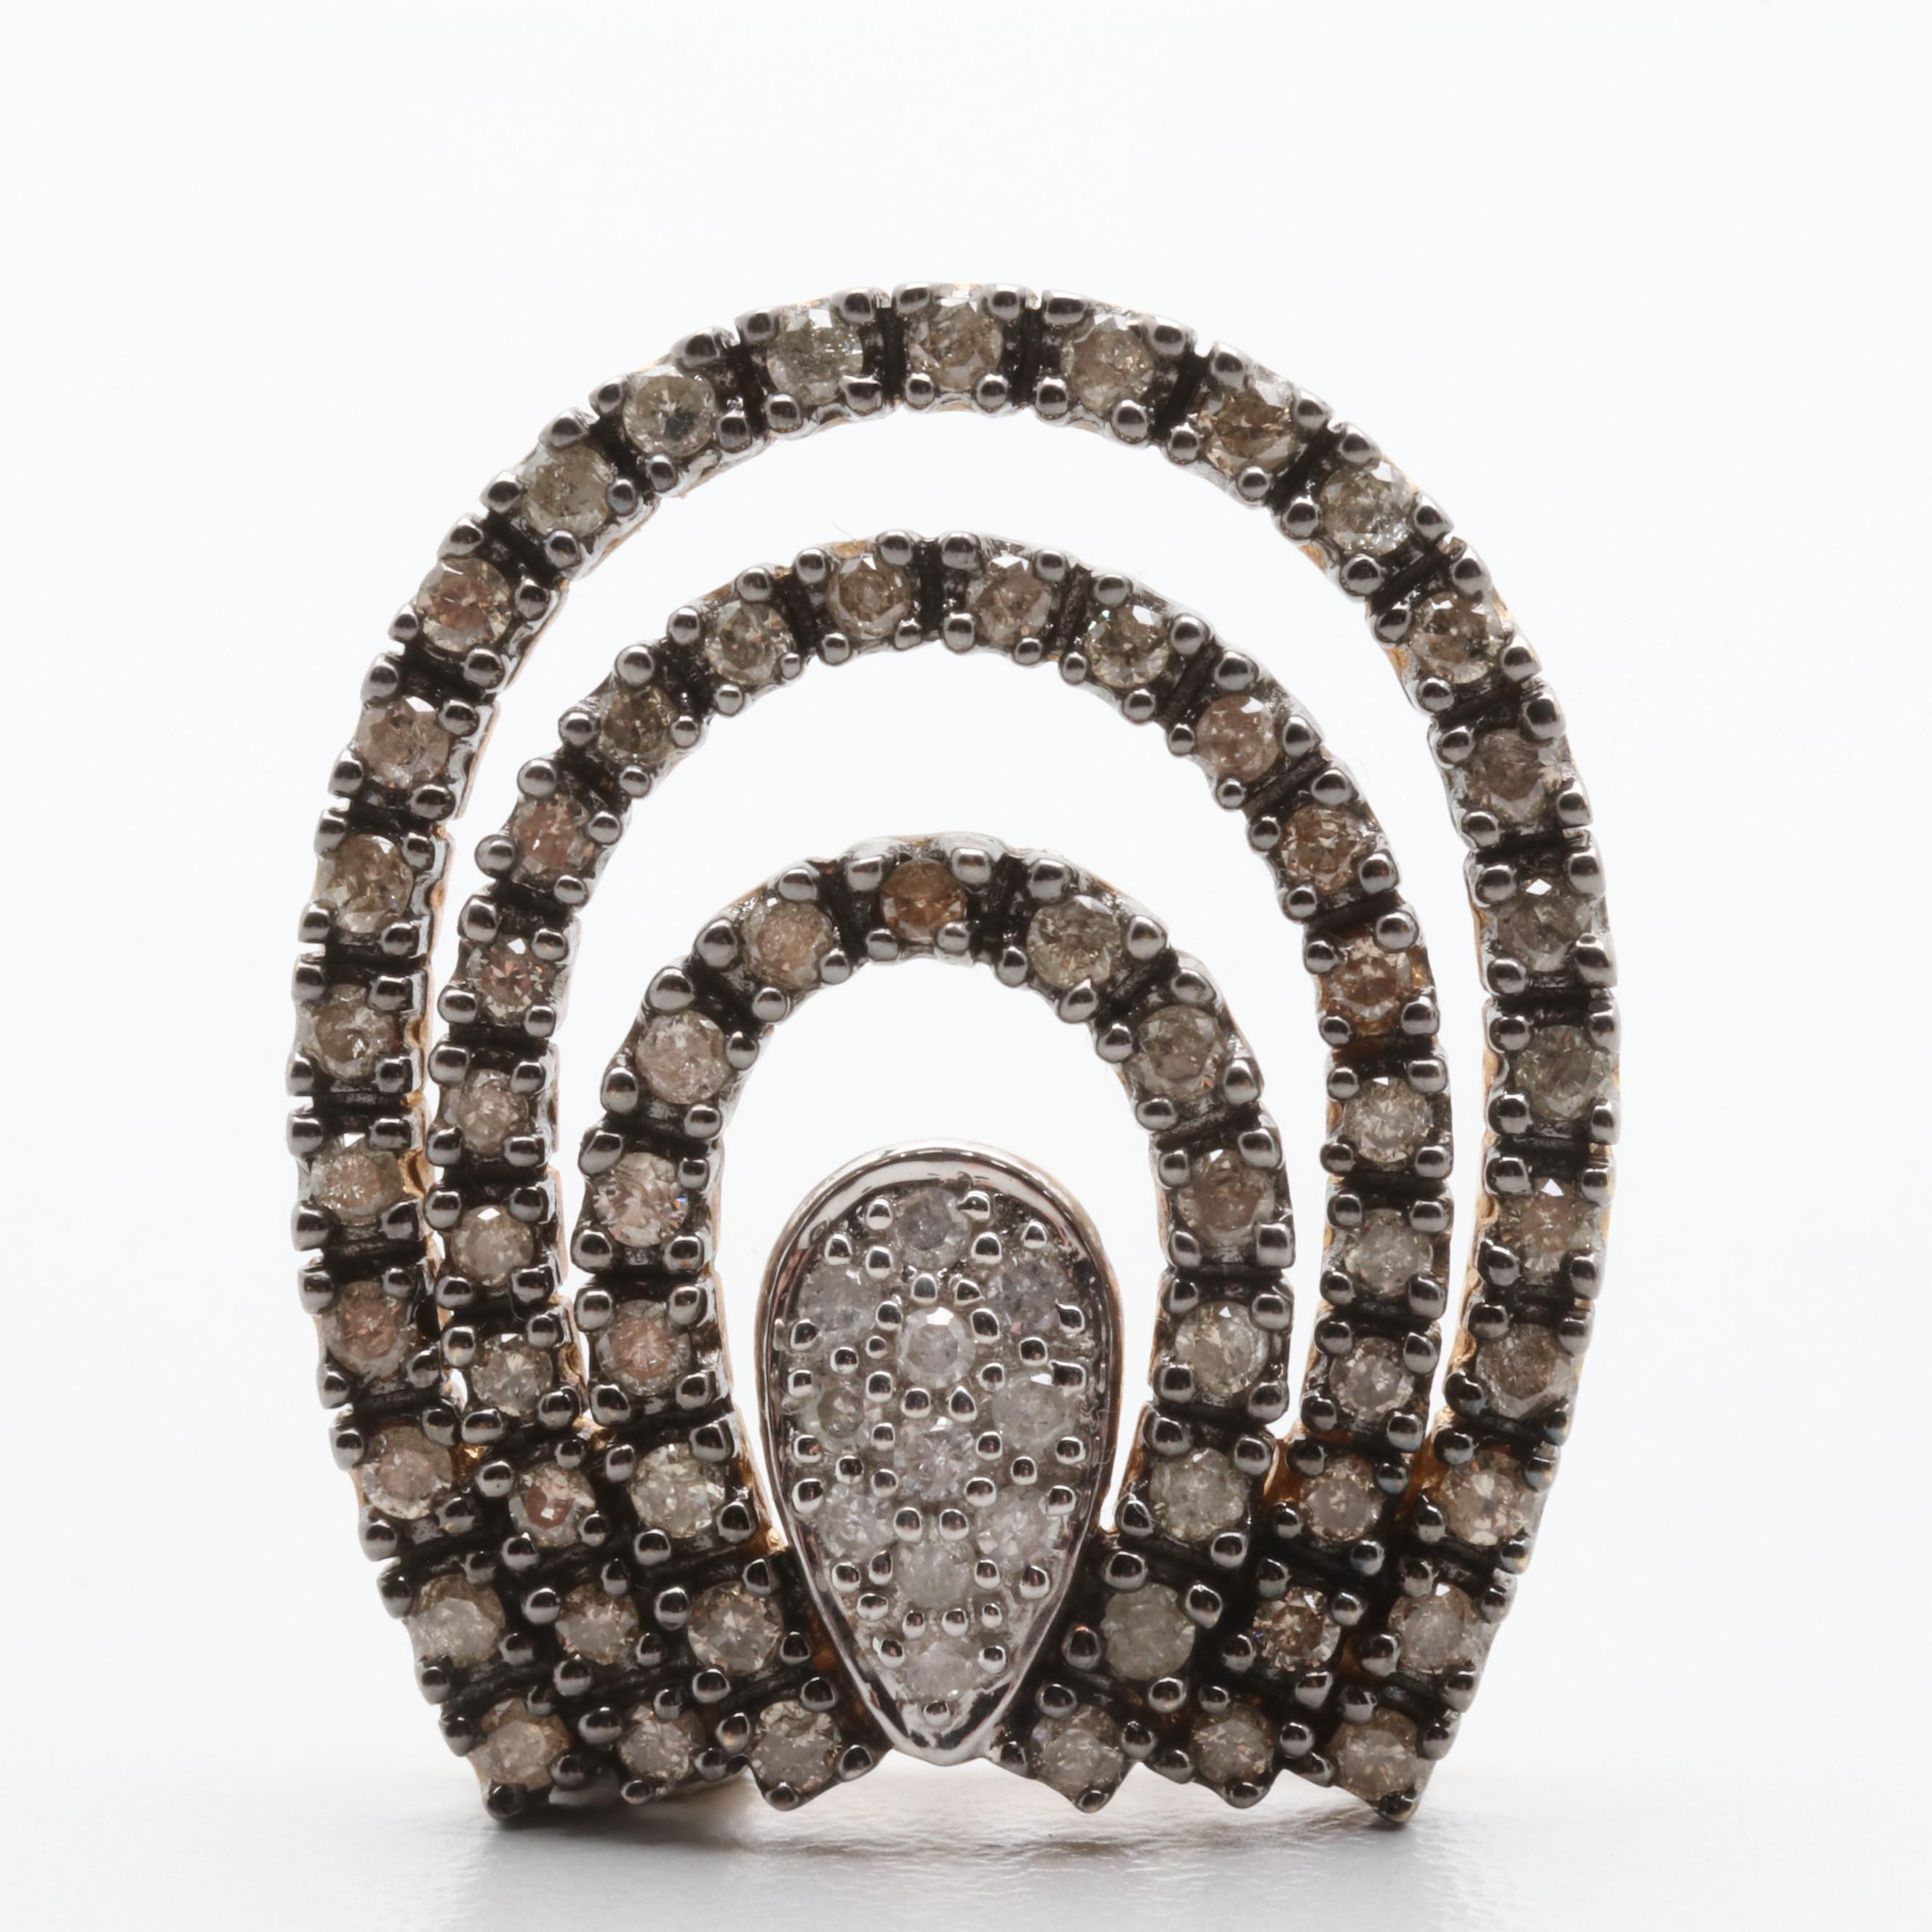 10K Yellow Gold Diamond Pendant with Black Finish